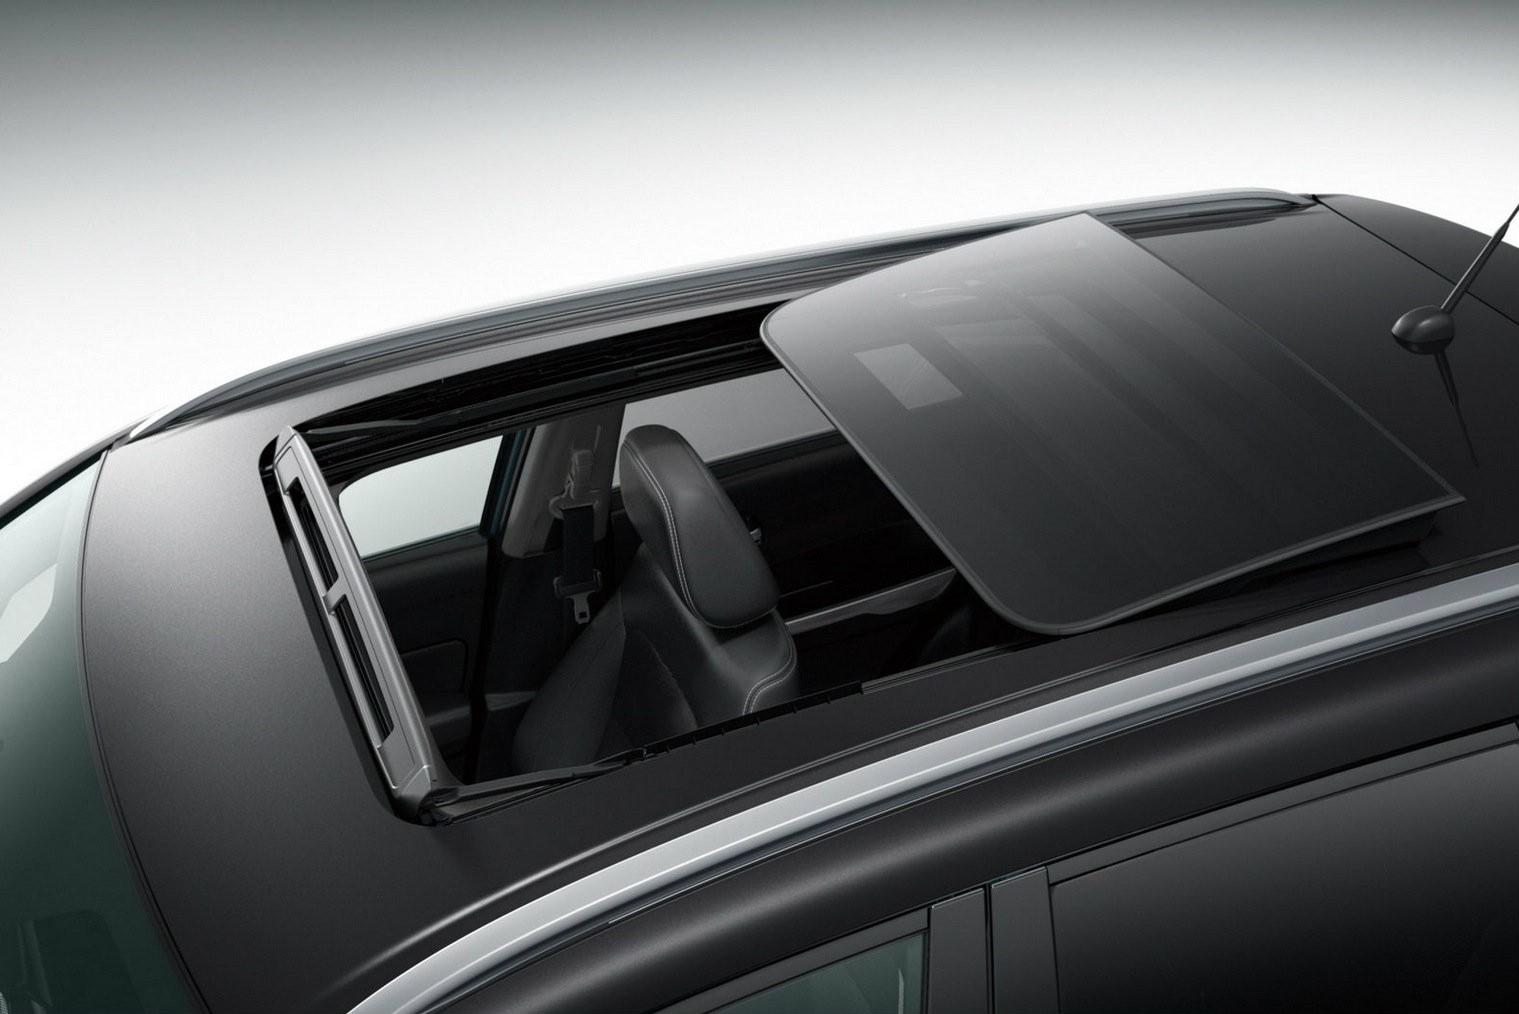 2015 Suzuki Vitara Web Black Edition Arriving In Europe